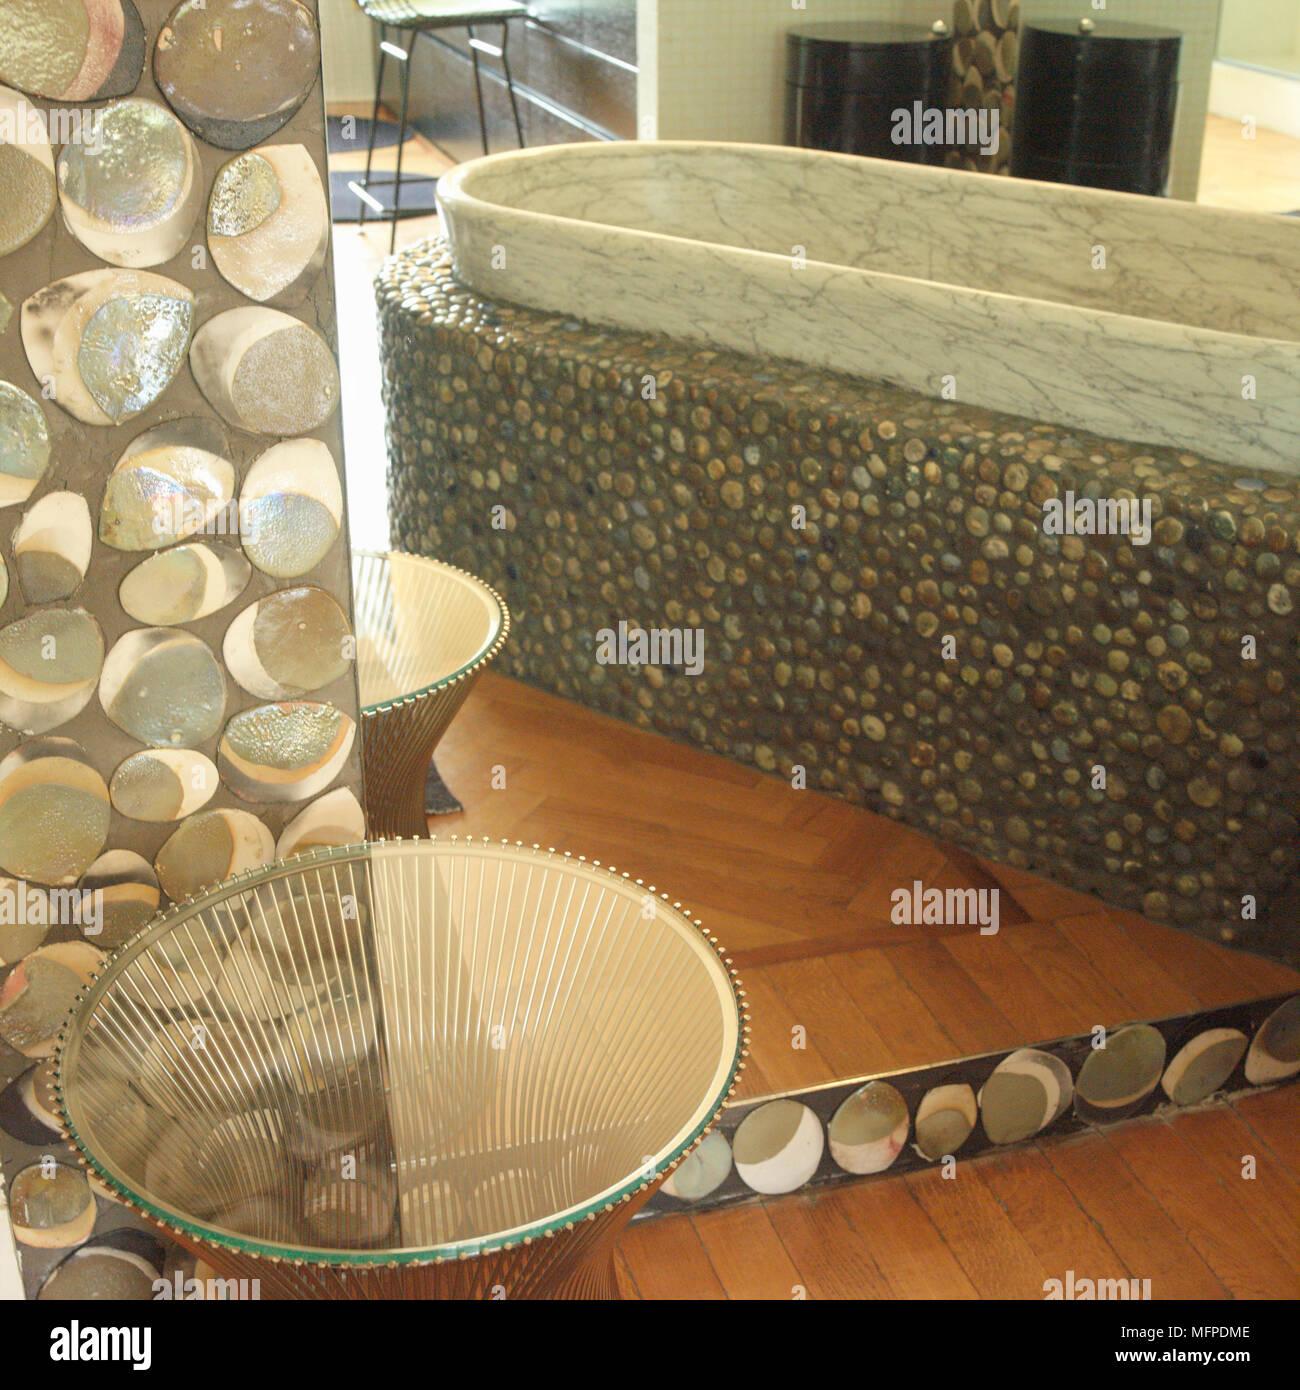 A modern bathroom, a marble bathtub set in a pebble and stone effect ...